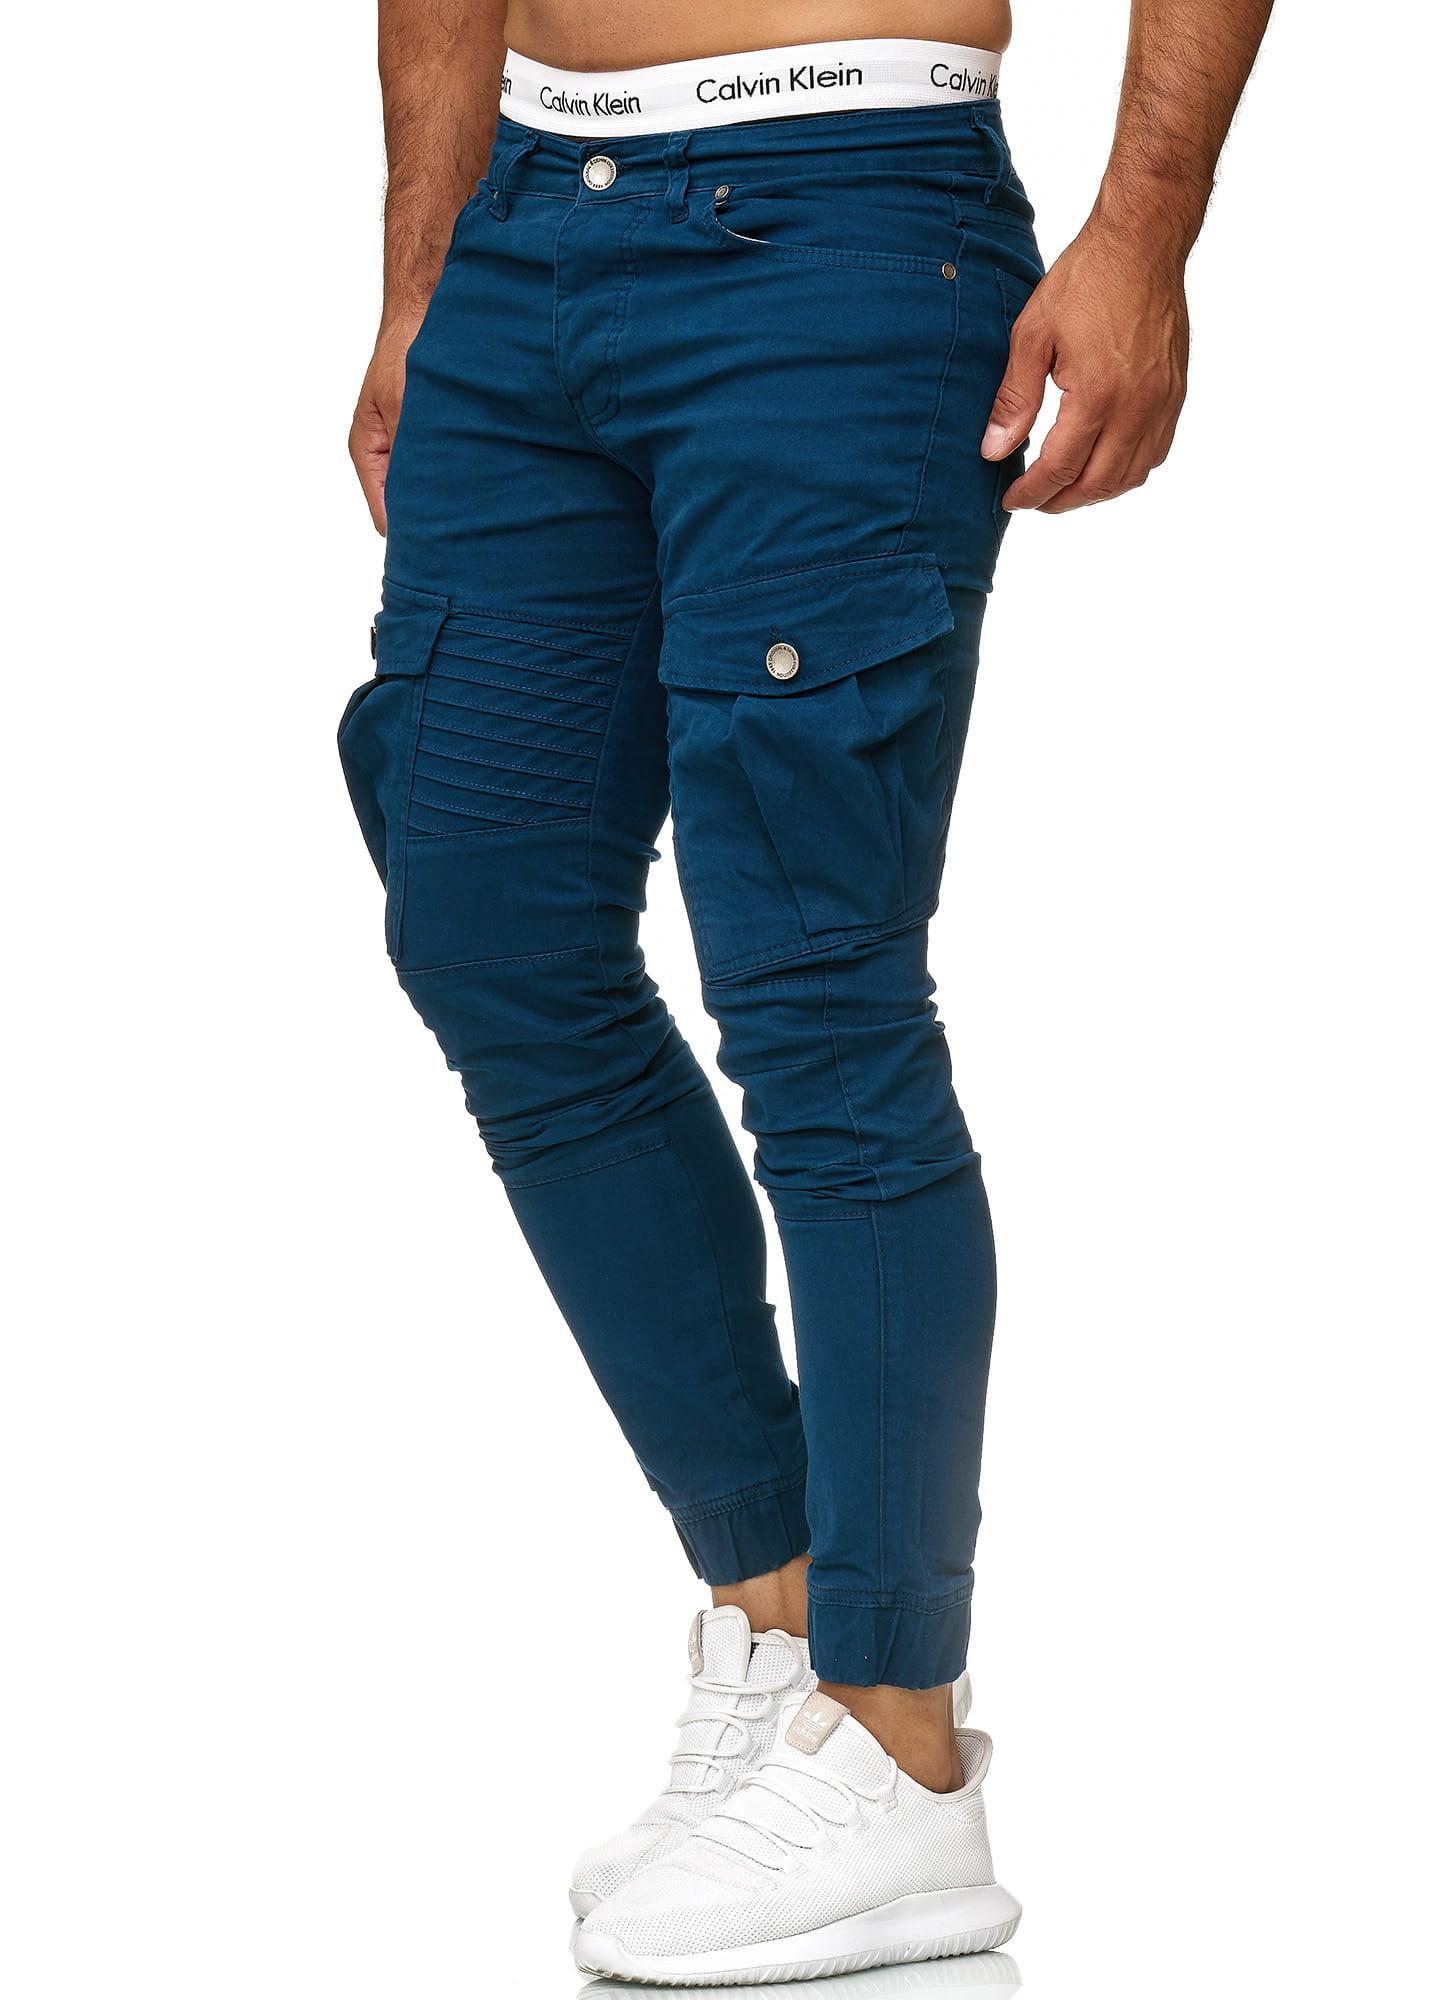 Herren Chino Hose Jeans Designer Chinohose Slim Fit Männer Skinny 1042